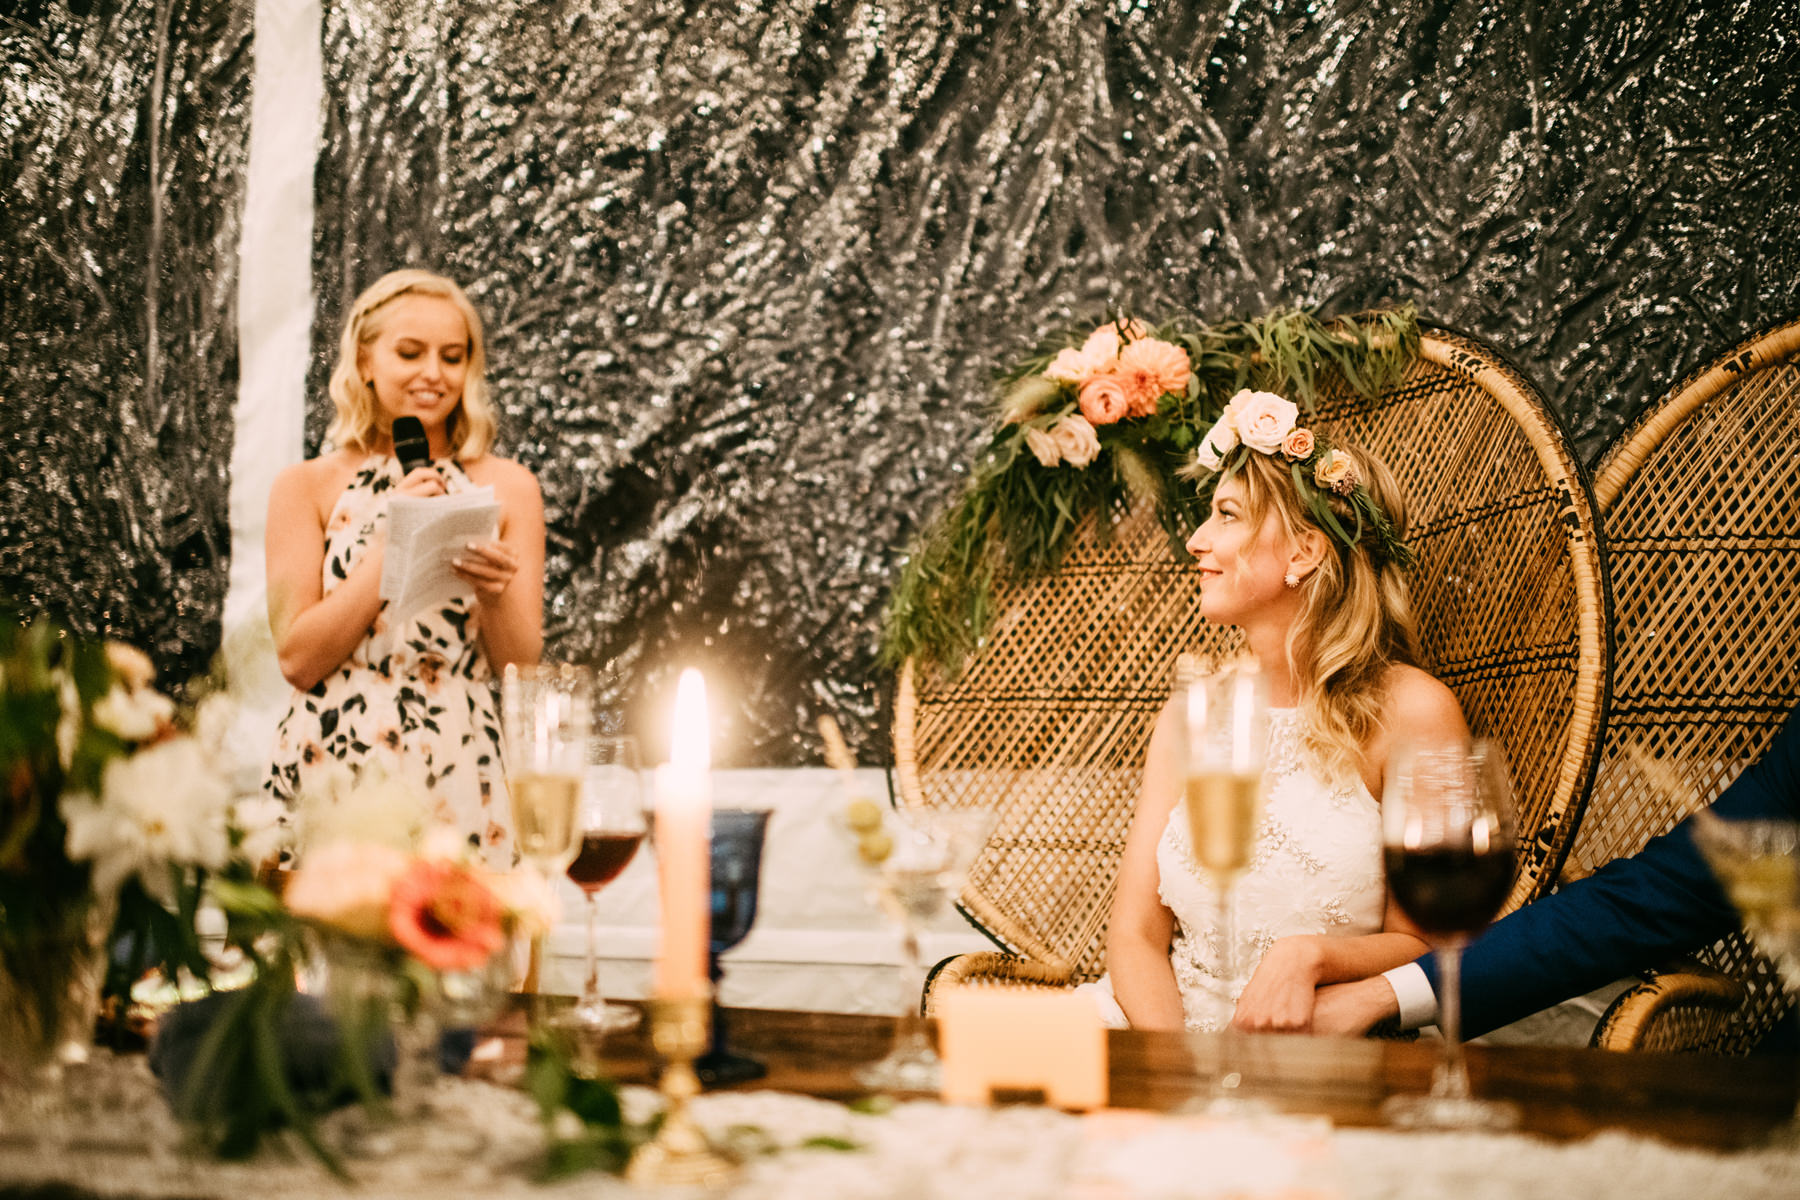 384-colorful-outdoor-lopez-island-wedding.jpg